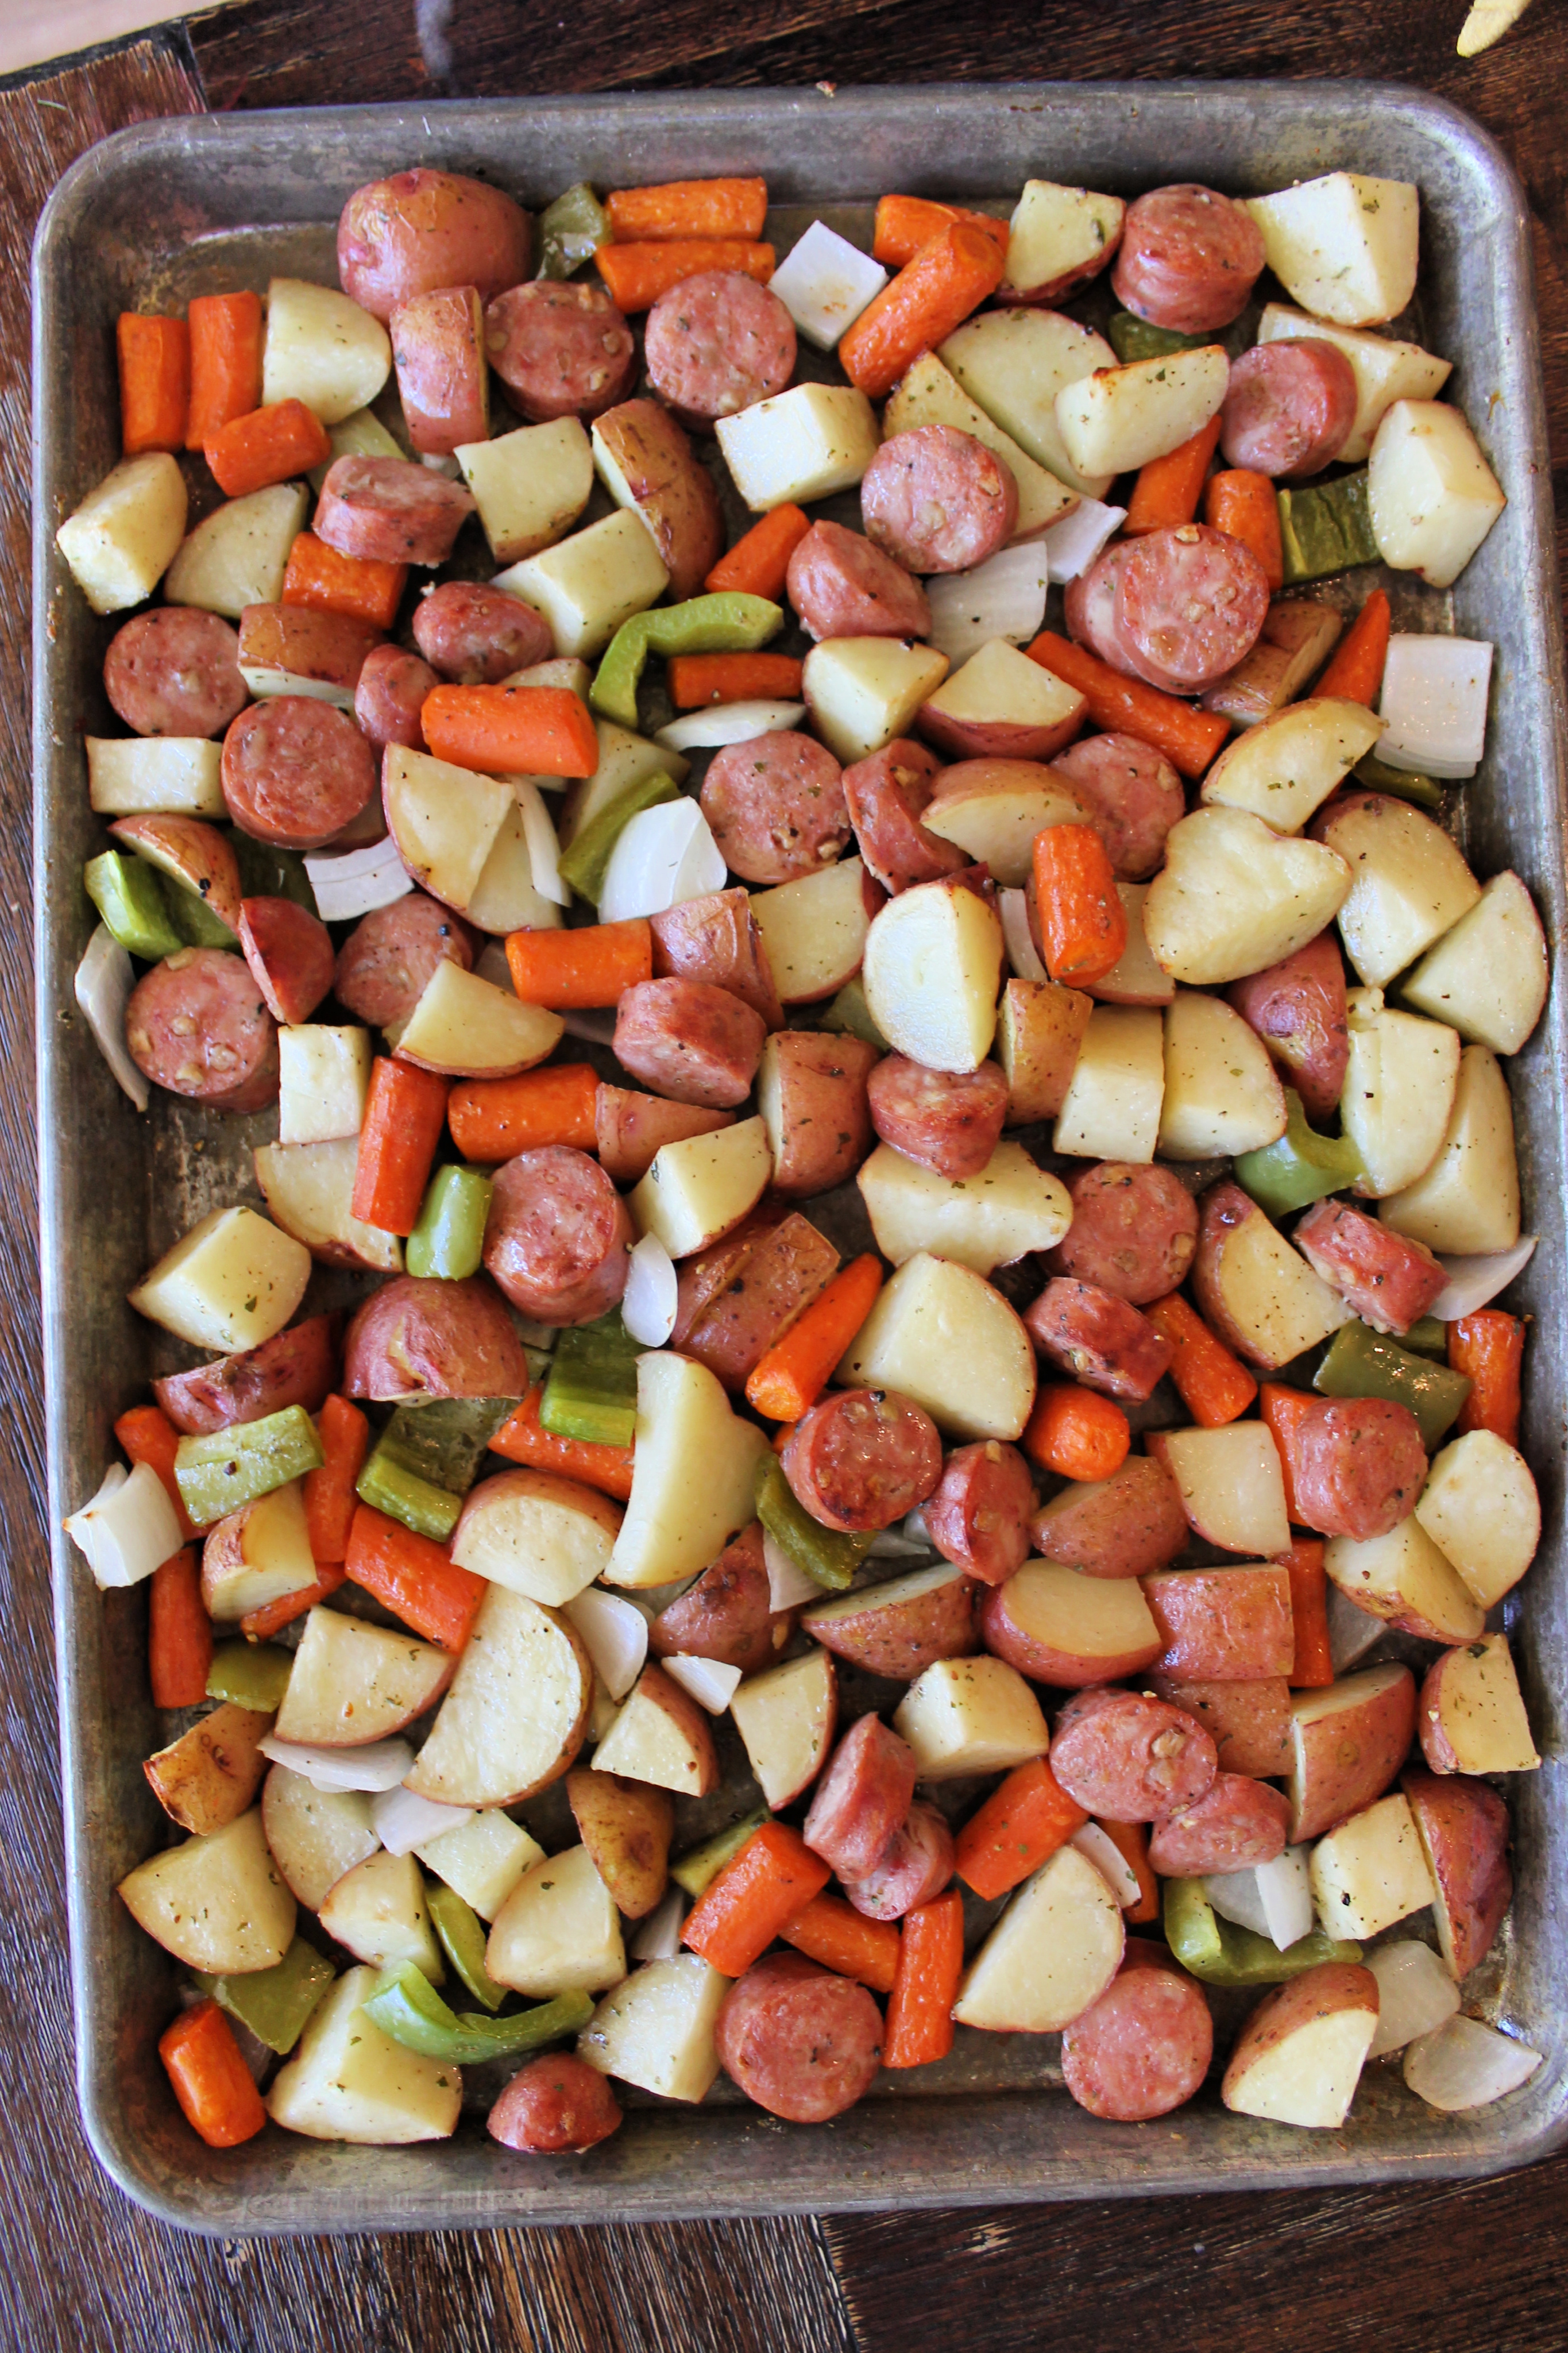 Sheet Pan Dinner: Sausage and Vegetables!